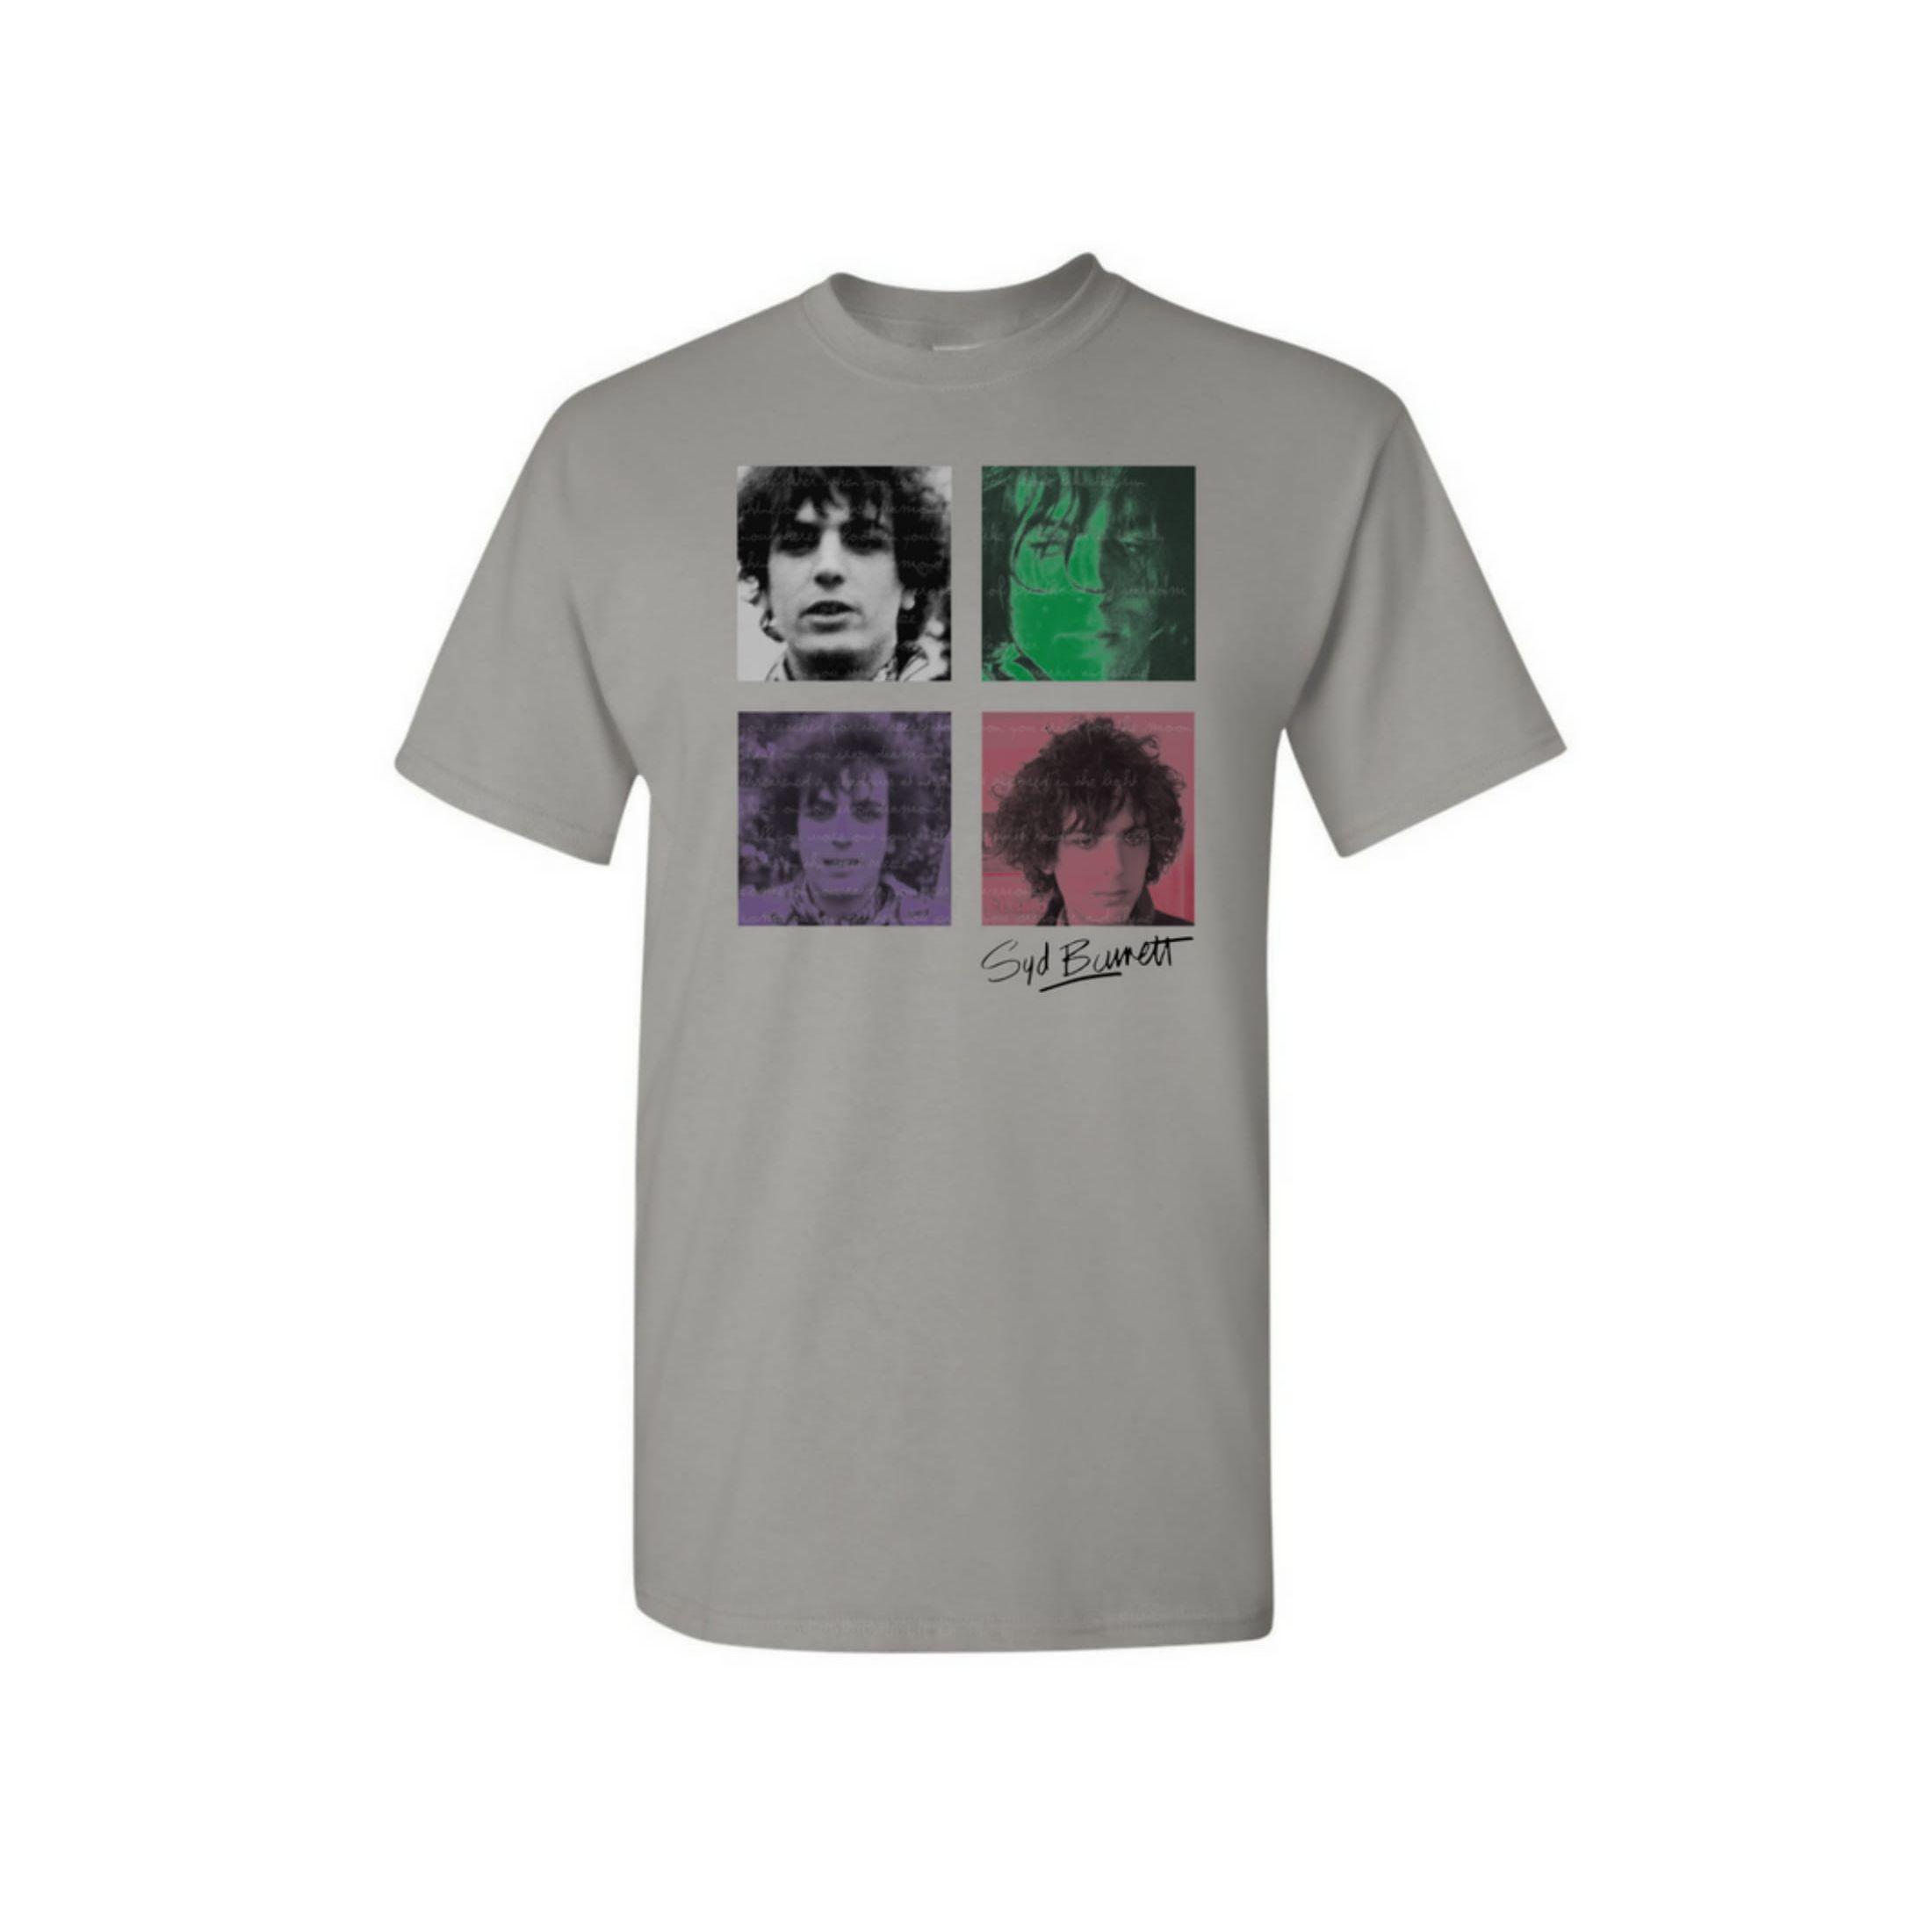 Four Shades Charcoal T-Shirt